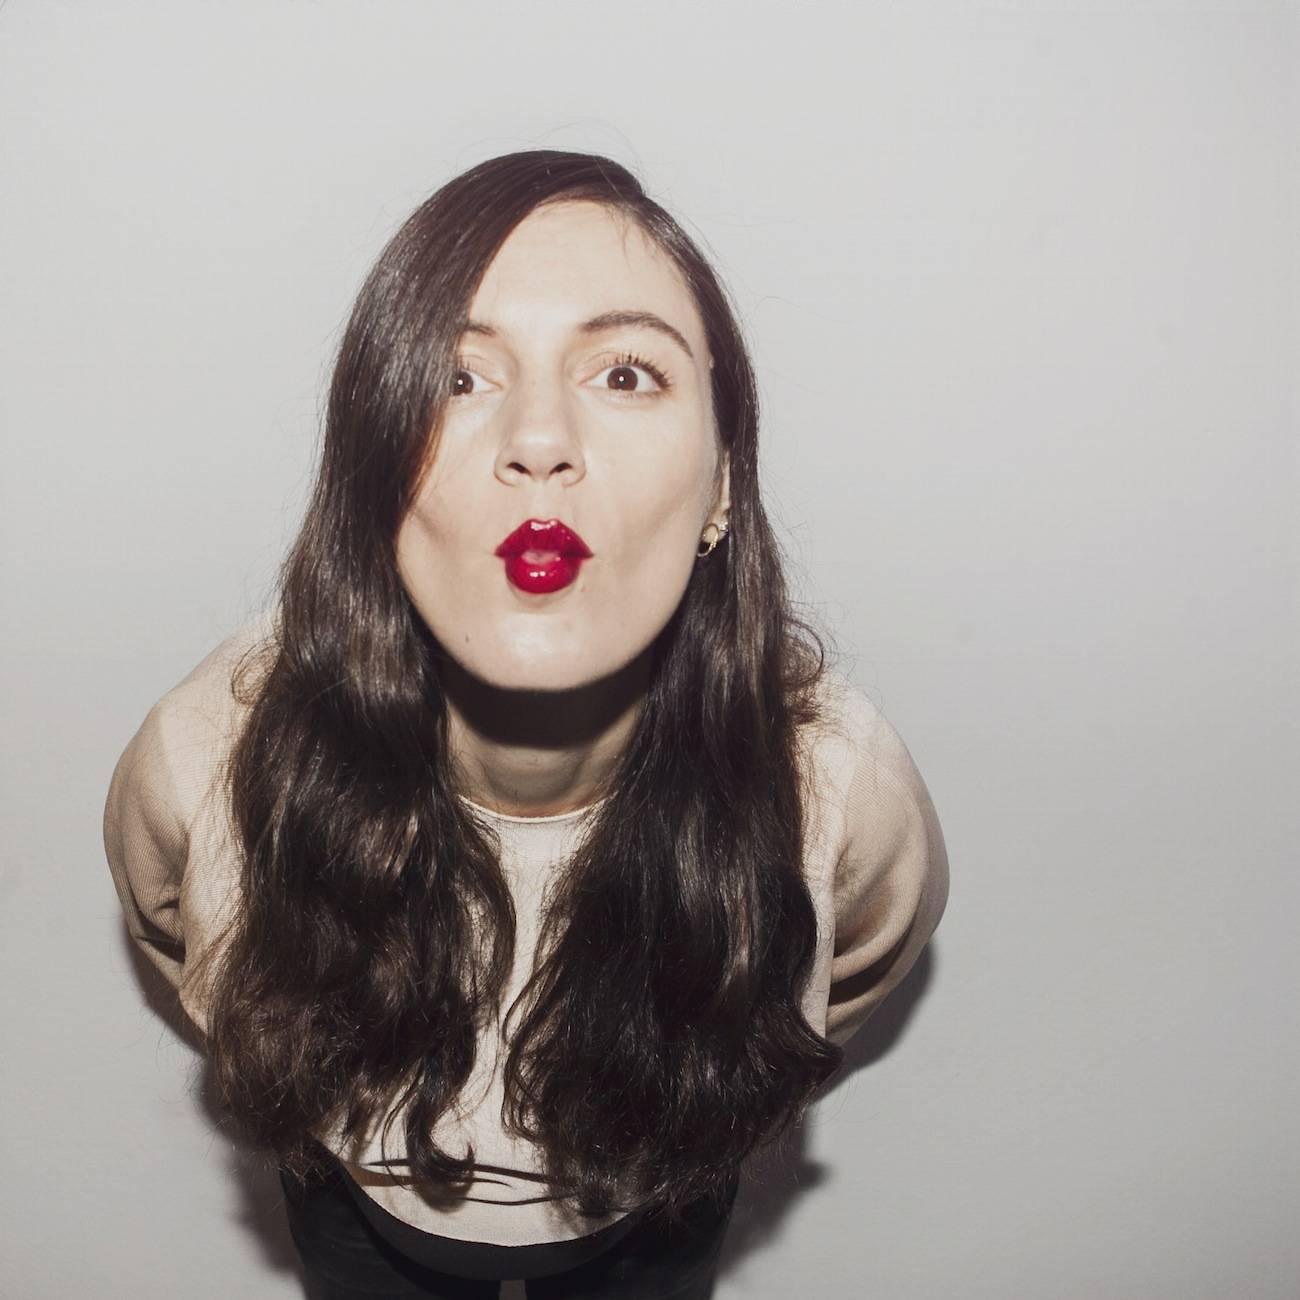 ysmf.korres.morello.lipstick.burgundy.red.59.closeup